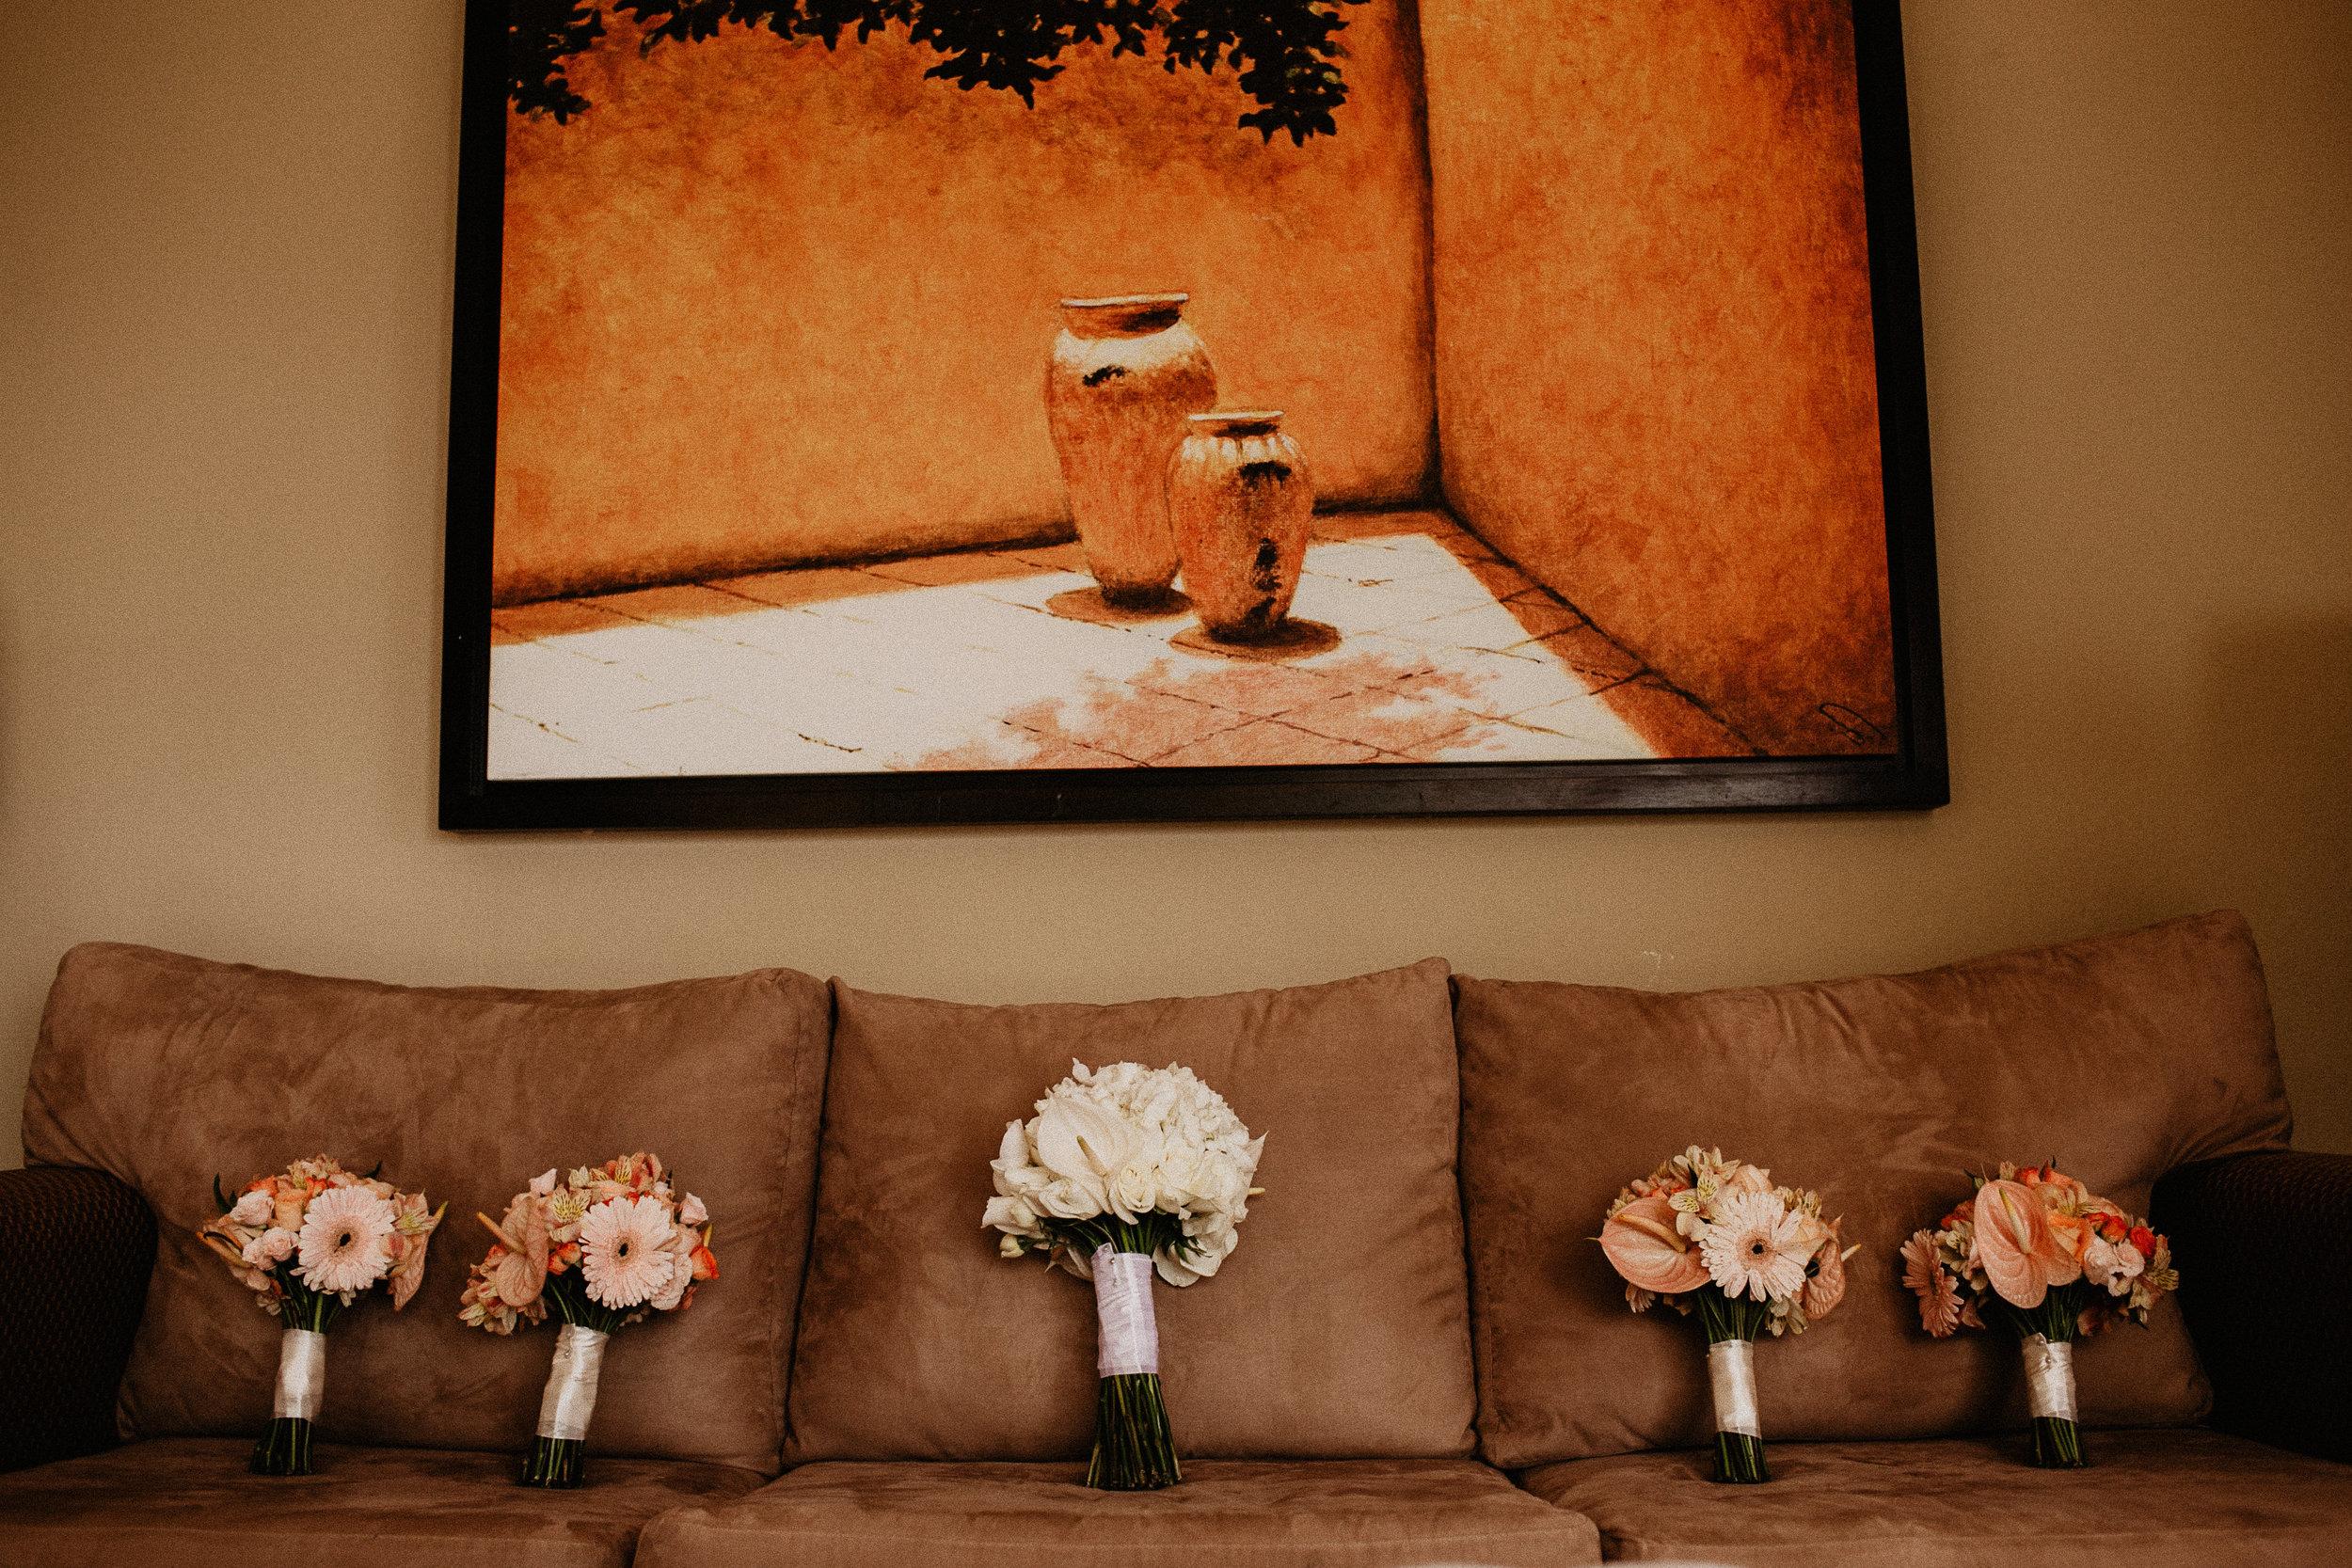 alfonso_flores_destination_wedding_photography_puerto_vallarta_hotel_barcelo_vallarta_cuttler_amela-73.JPG